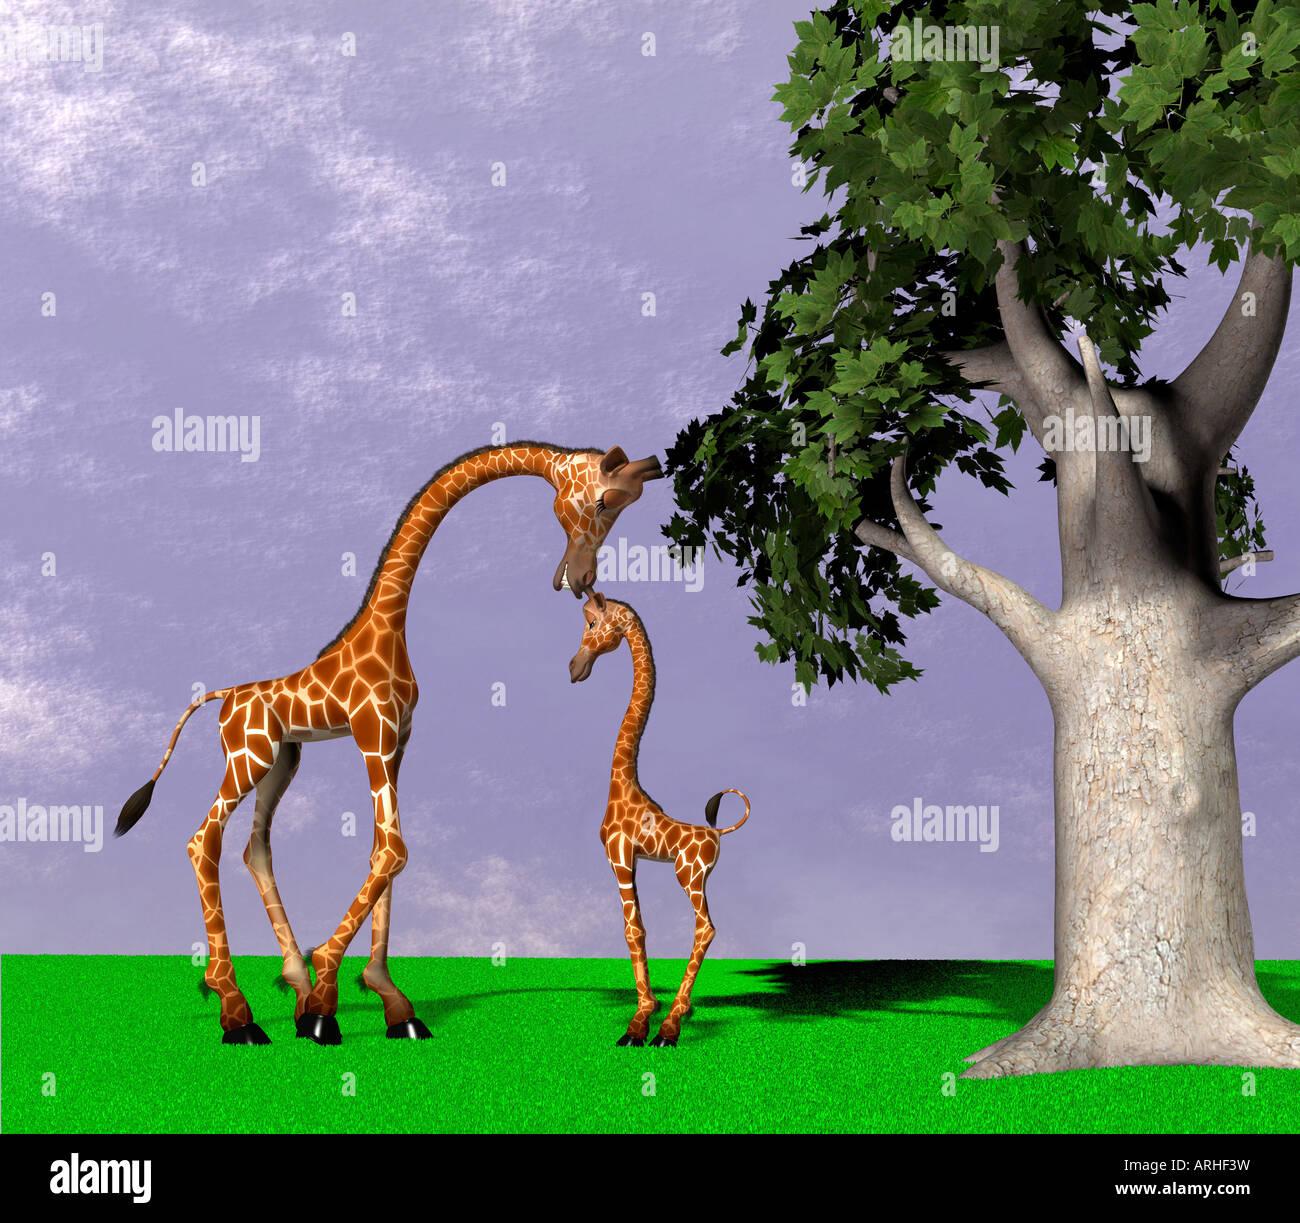 giraffes - Stock Image